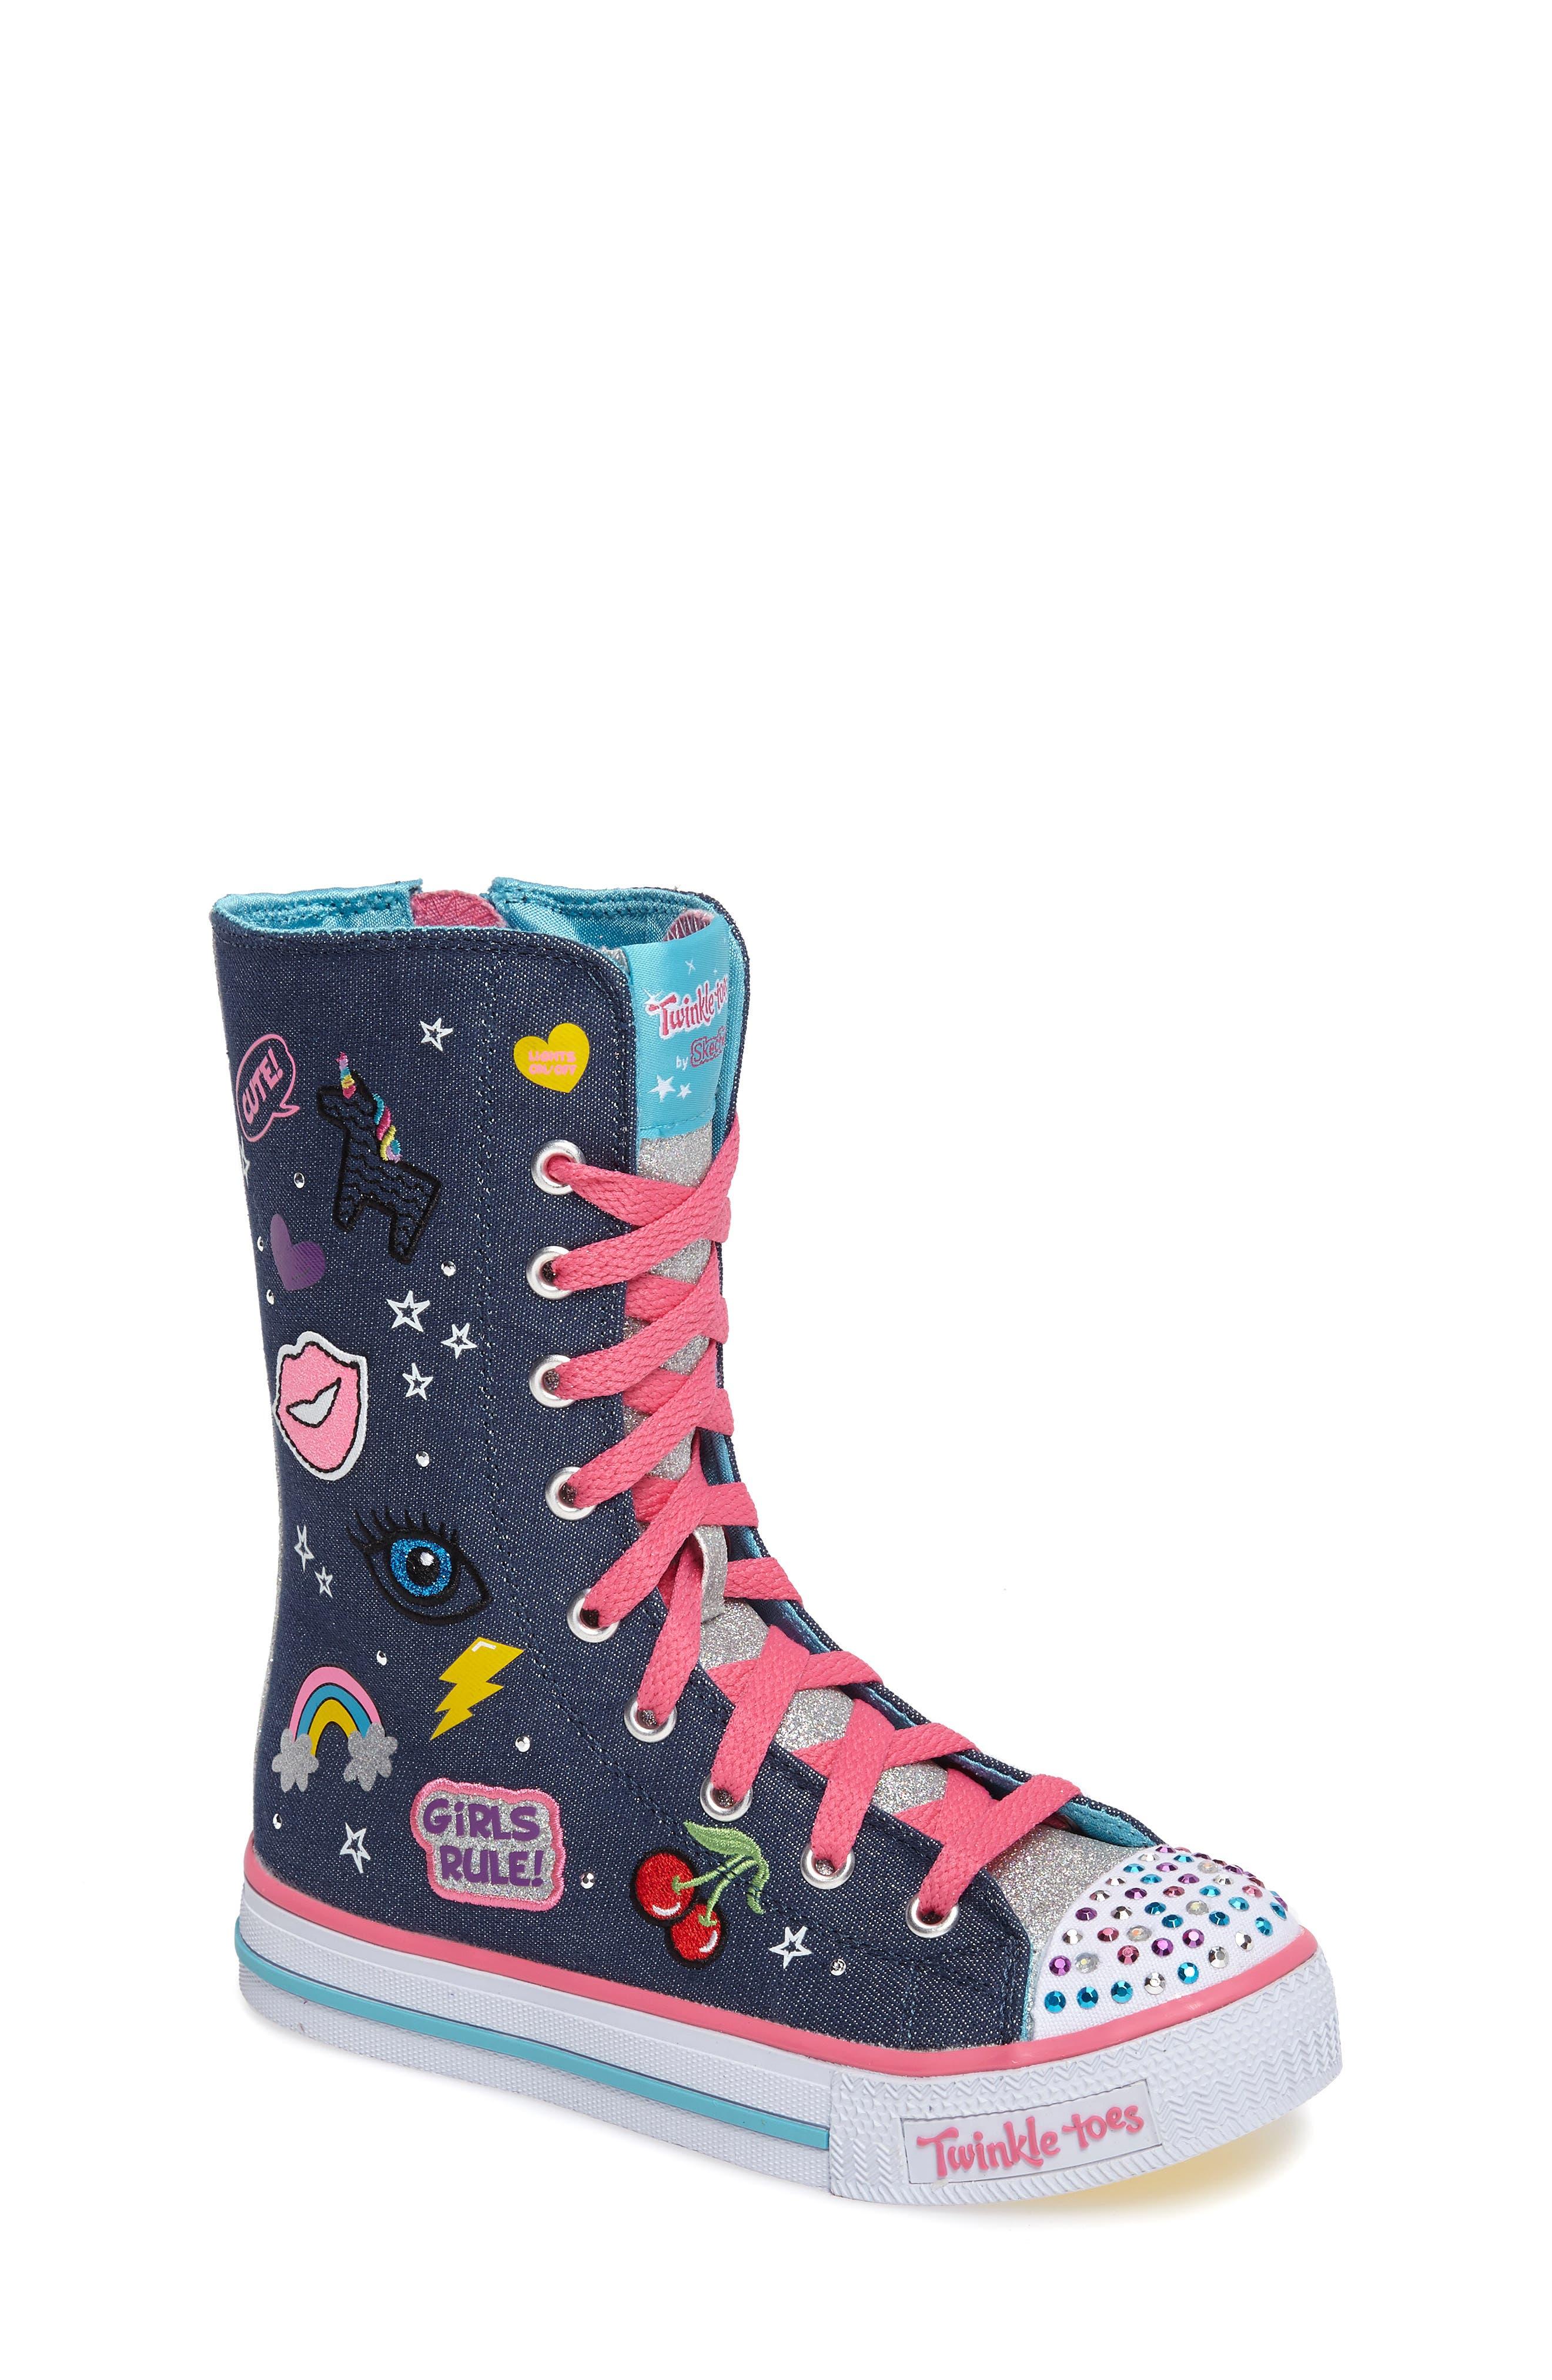 Twinkle Toes Shuffles Ultra High Top Sneaker,                             Main thumbnail 1, color,                             Denim/ Multi